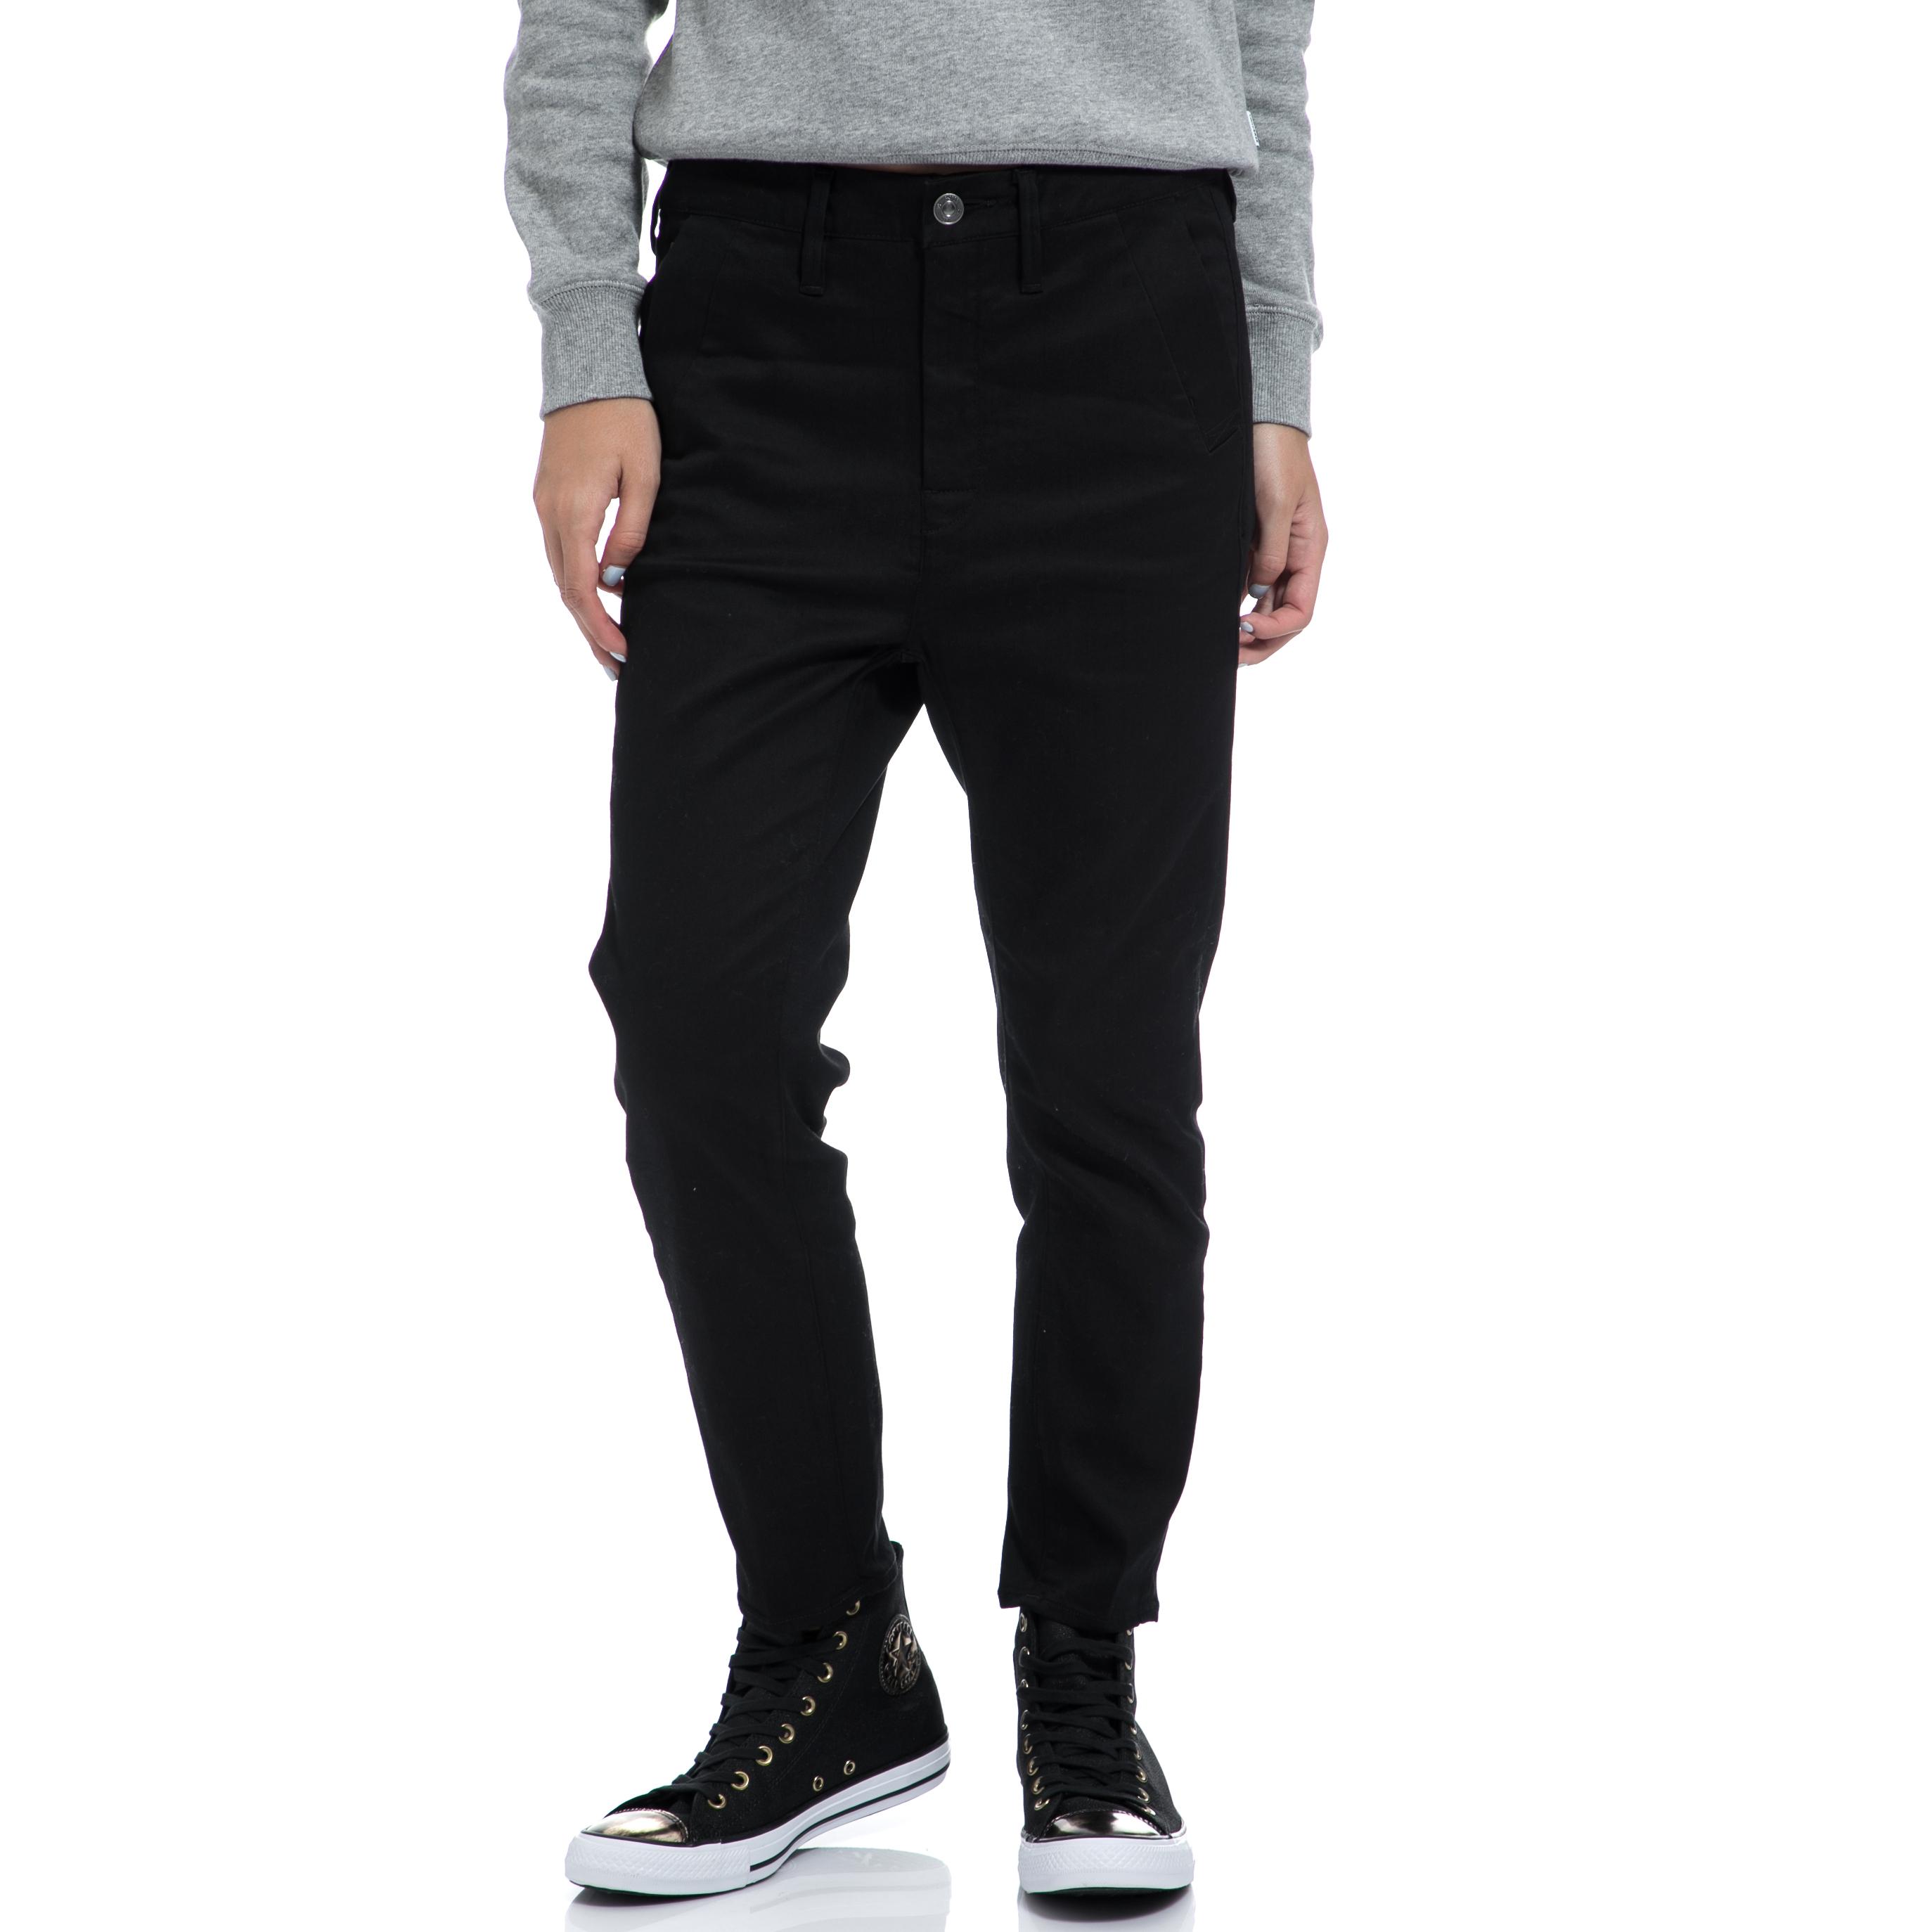 G-STAR RAW - Γυναικείο παντελόνι G-STAR RAW μαύρο γυναικεία ρούχα παντελόνια ισια γραμμή